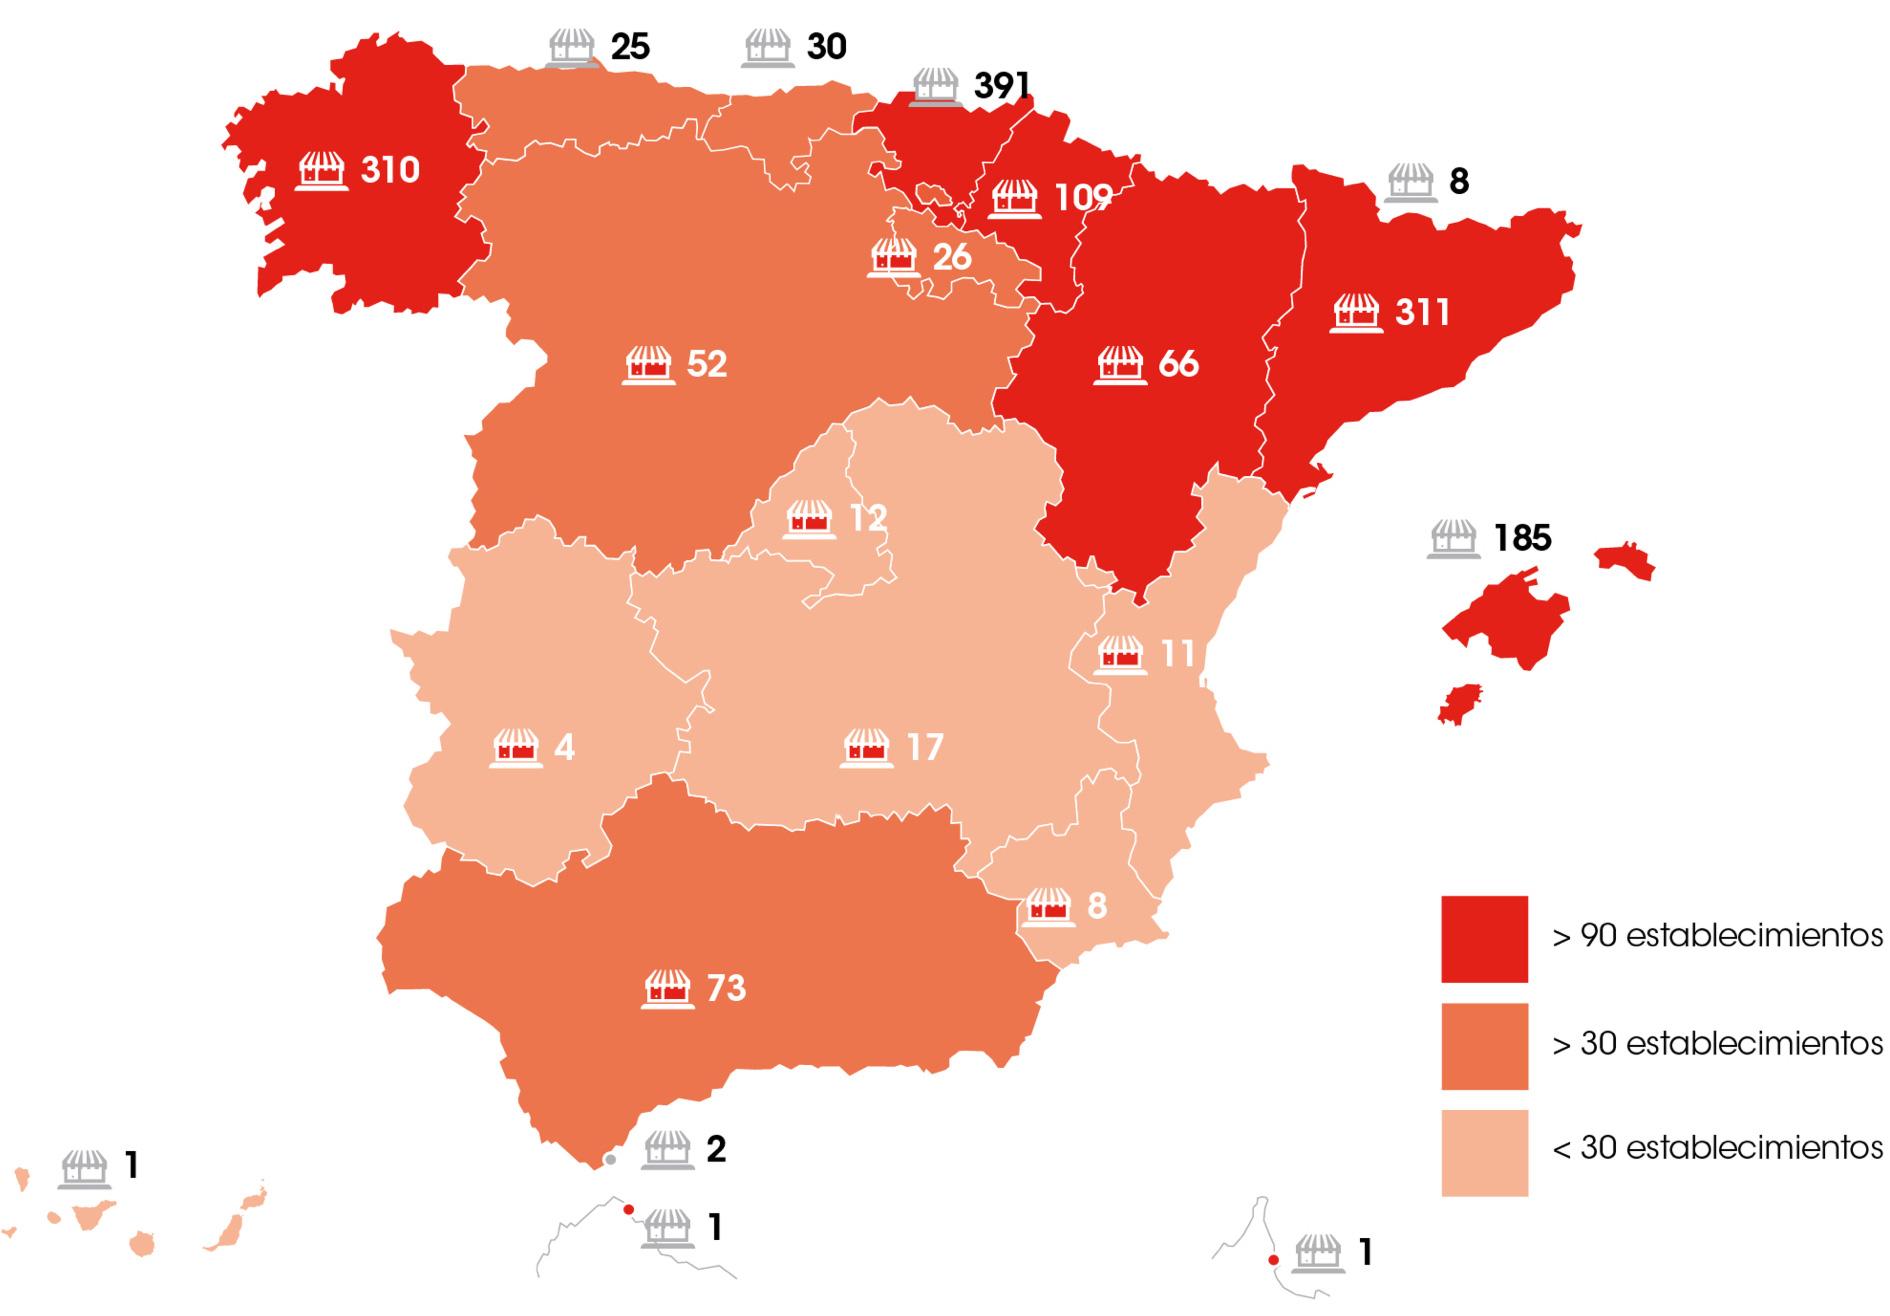 Maña de tiendas establecimiento Eroski en España